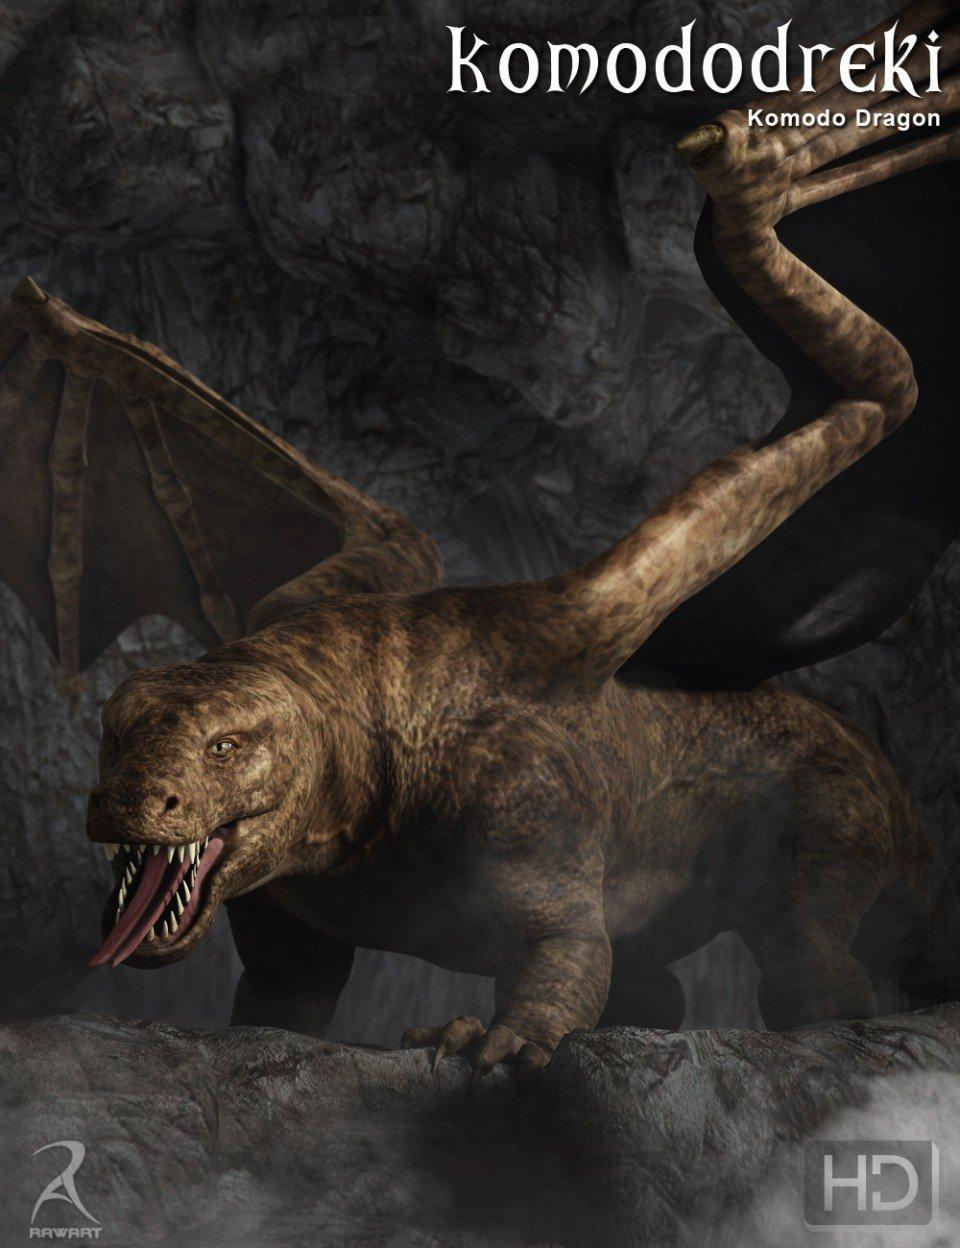 Komododreki – The Komodo Dragon HD_DAZ3D下载站